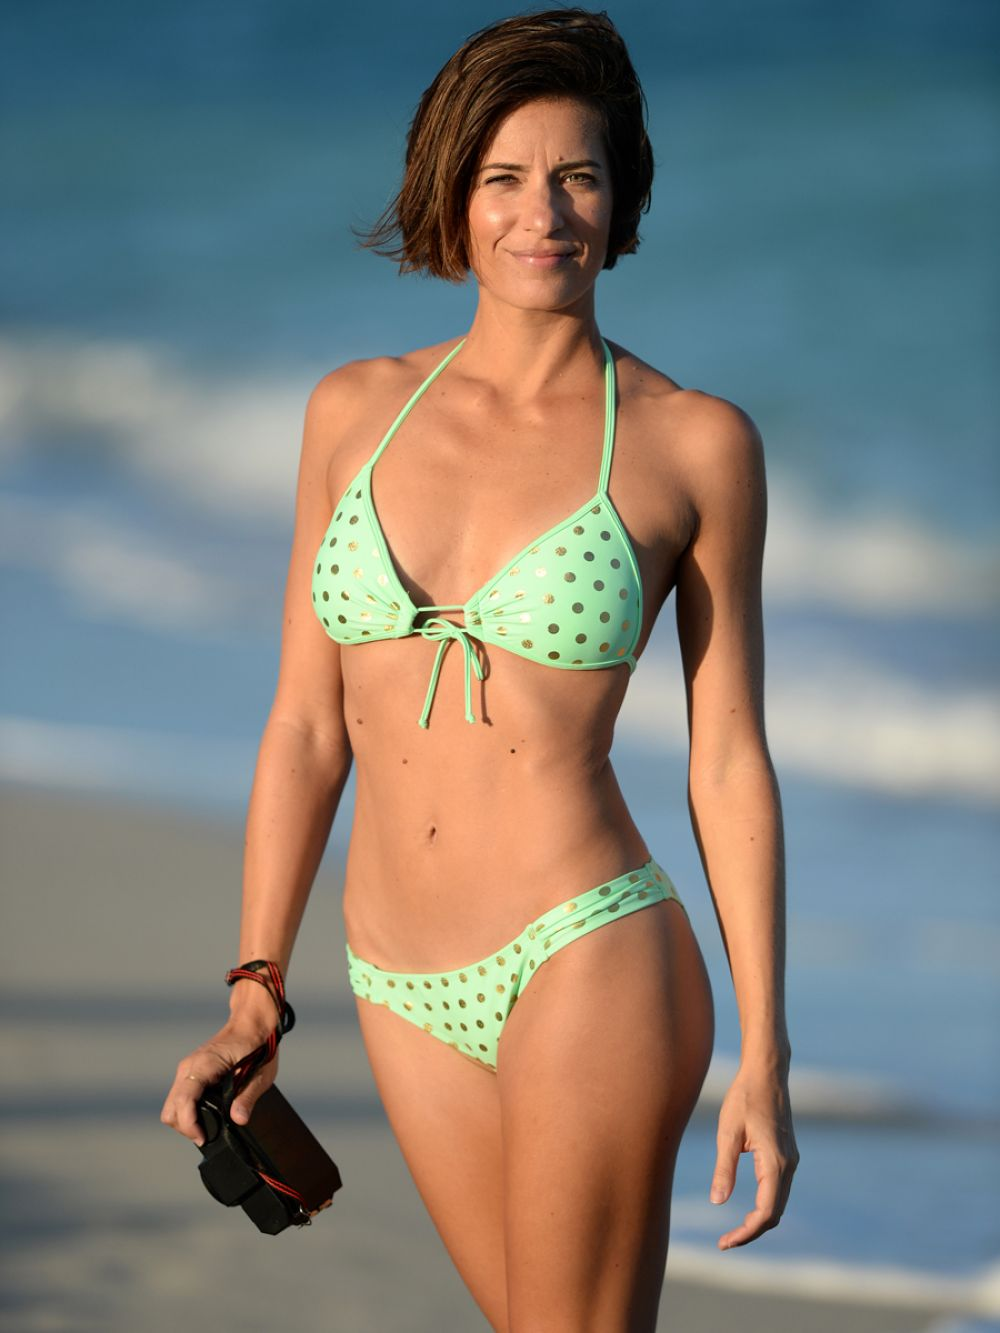 Paparazzi Aida Yespica nude (55 photo), Topless, Paparazzi, Boobs, butt 2020